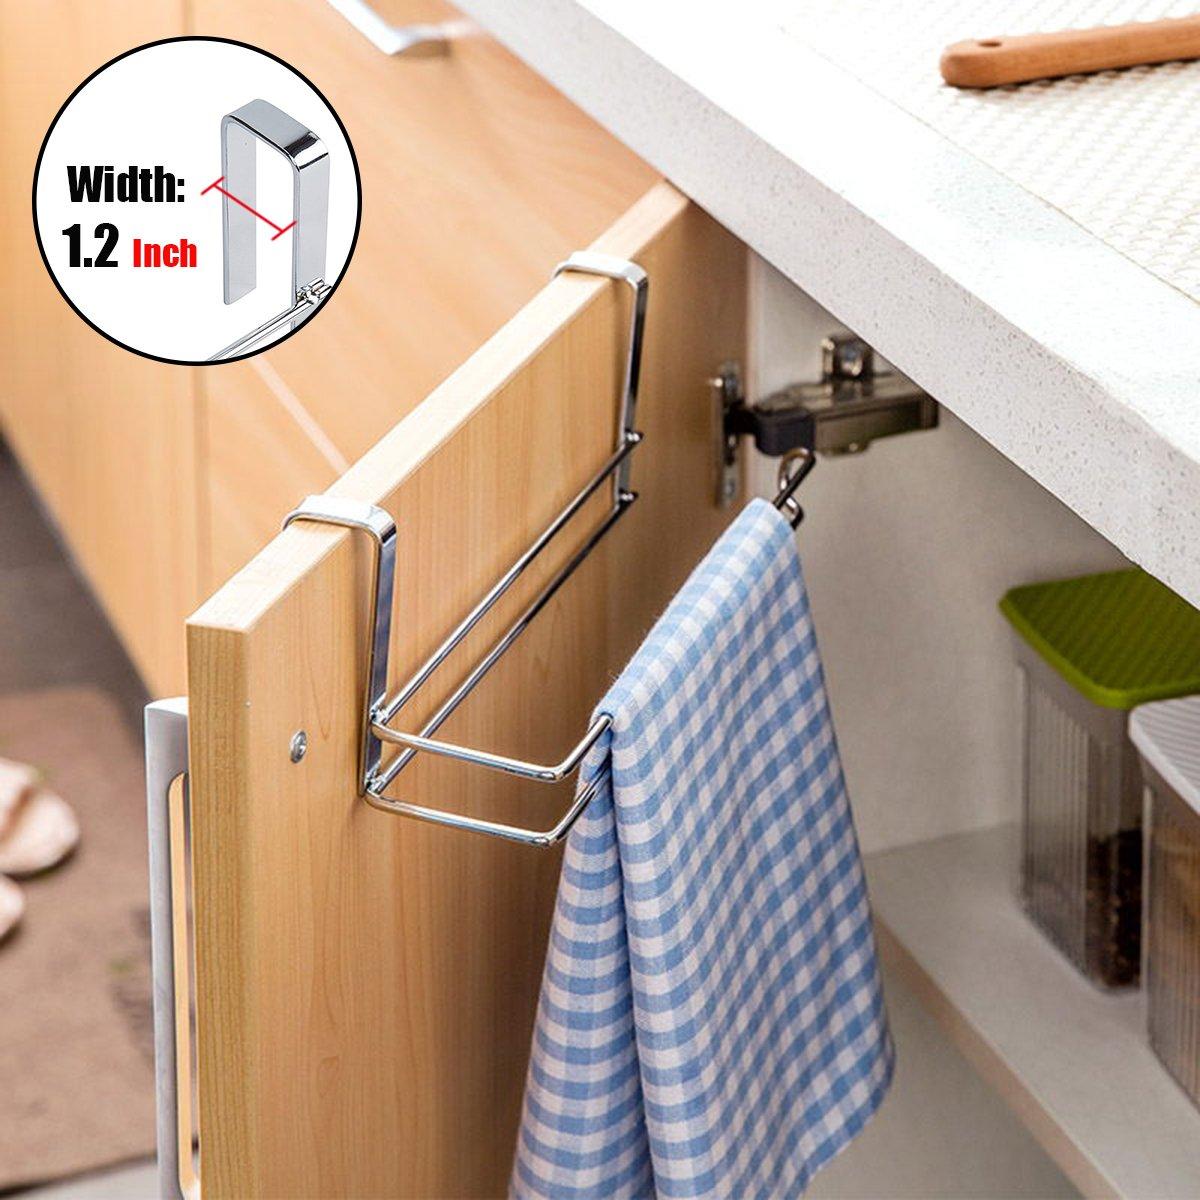 Stainless Steel Aiduy Hanging Paper Towel Holder Under Cabinet Paper Towel Rack Hanger Over the Door Kitchen Roll Holder Paper Towel Holder